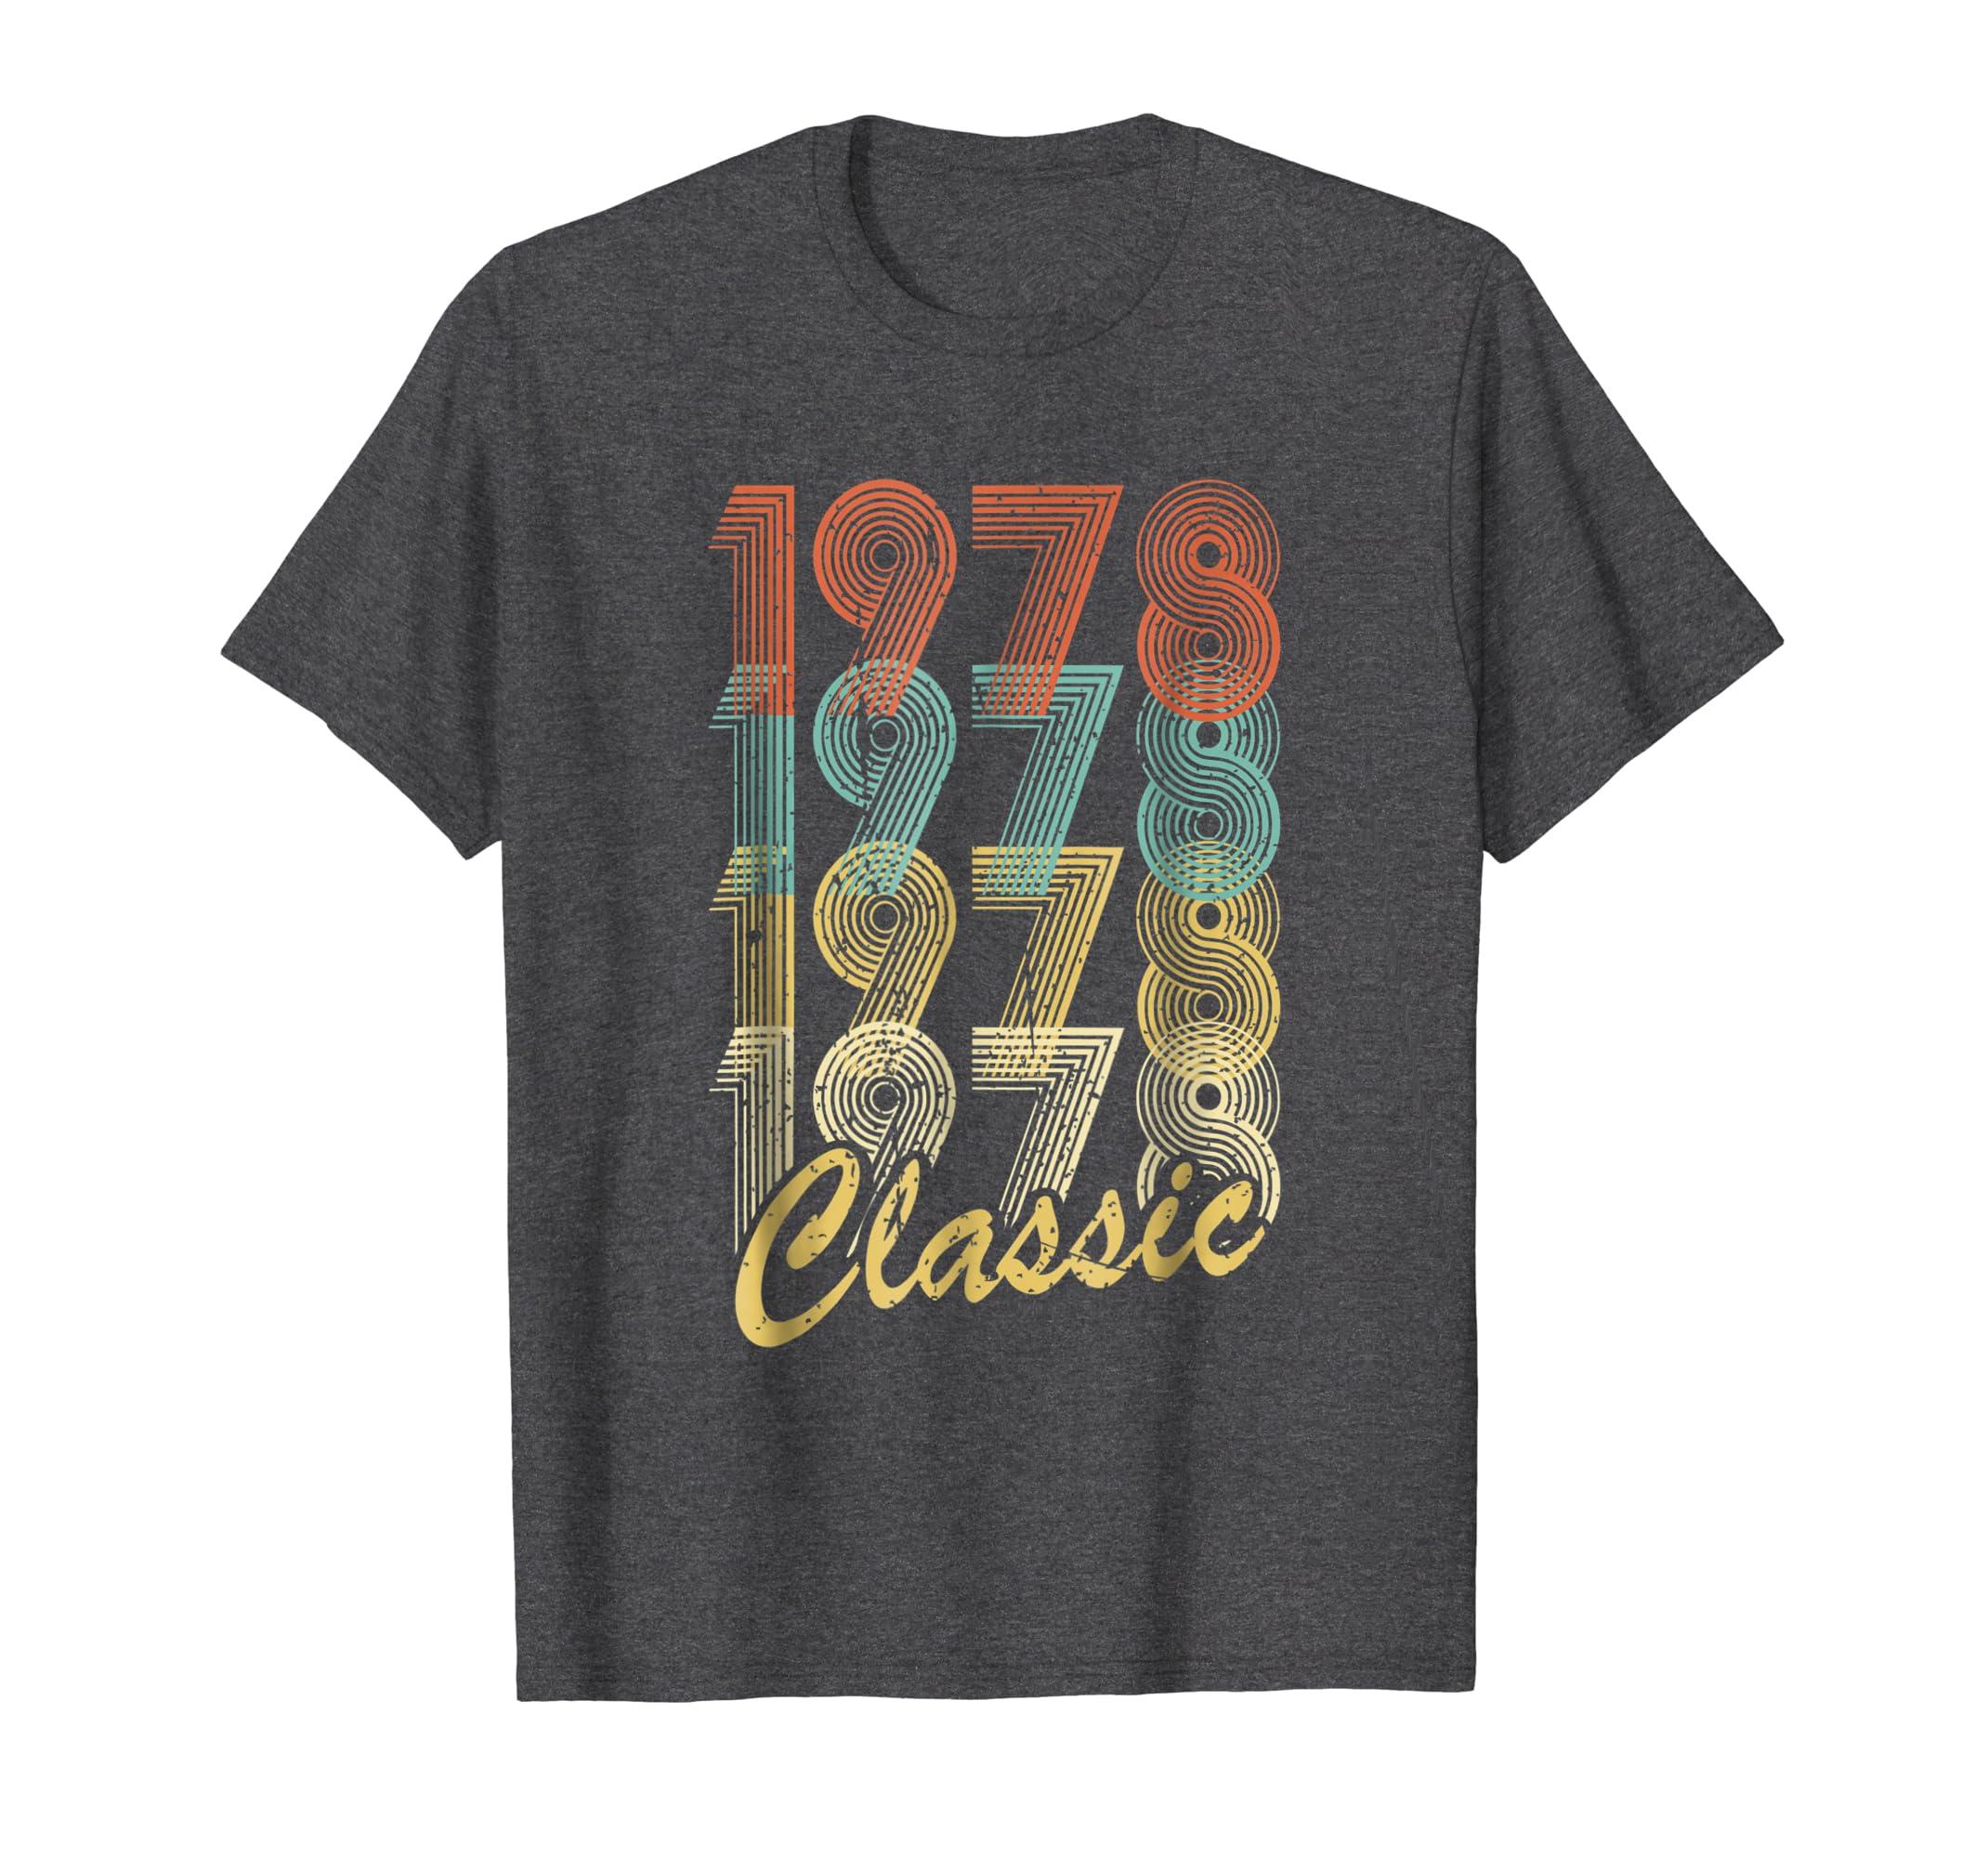 40th Birthday Gift Retro style 1978 Classic Vintage T Shirt-Teesml